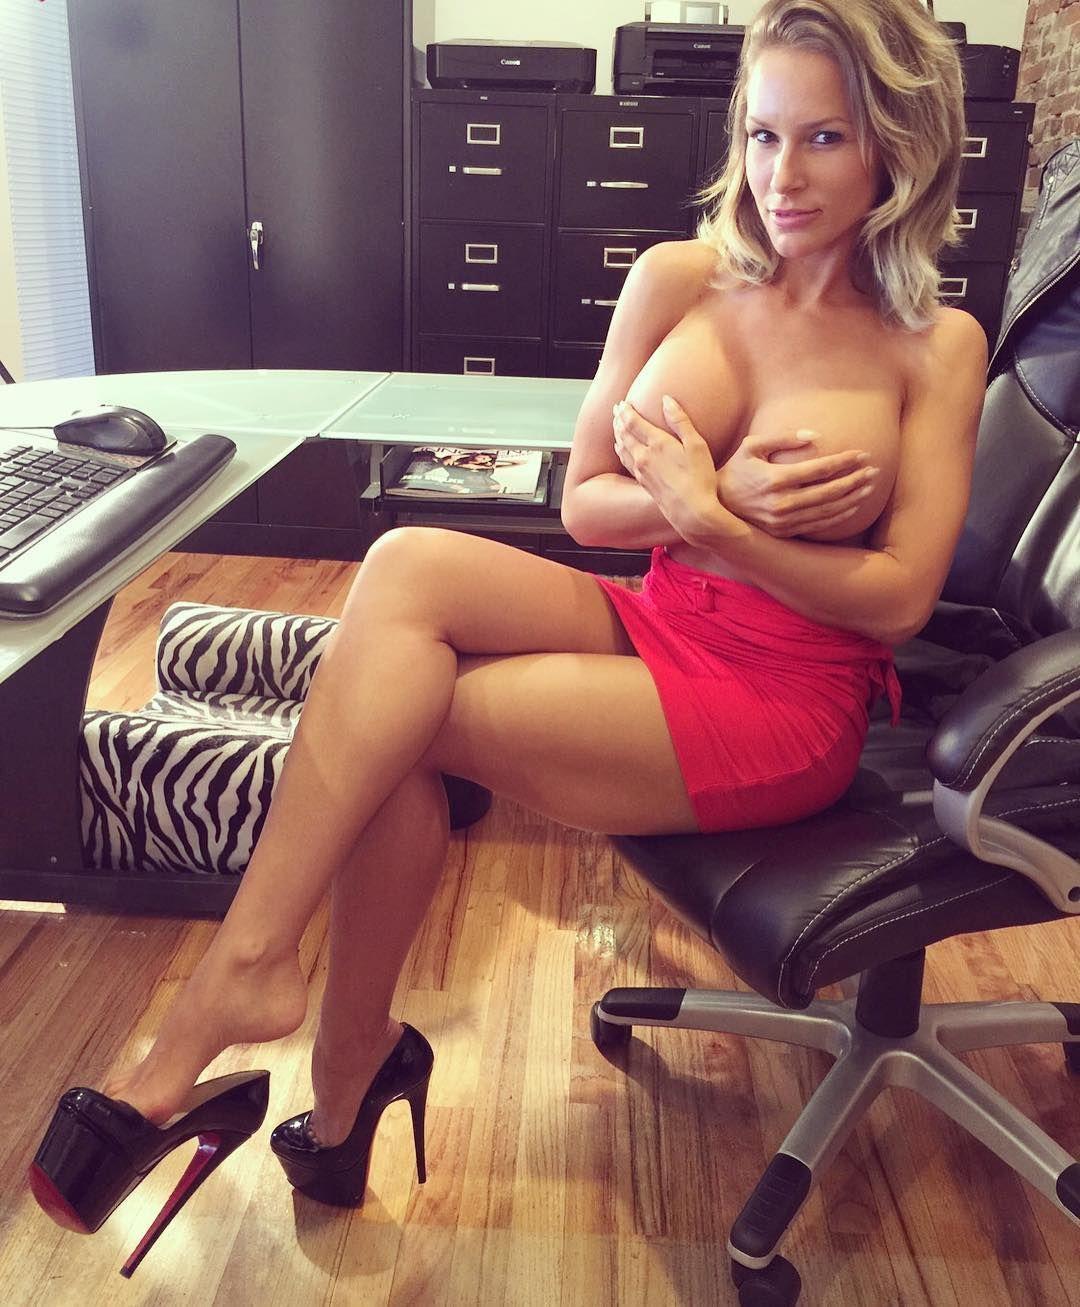 Hot Urad Babes Foto Prekrižani Noge Pinterest noge-2524